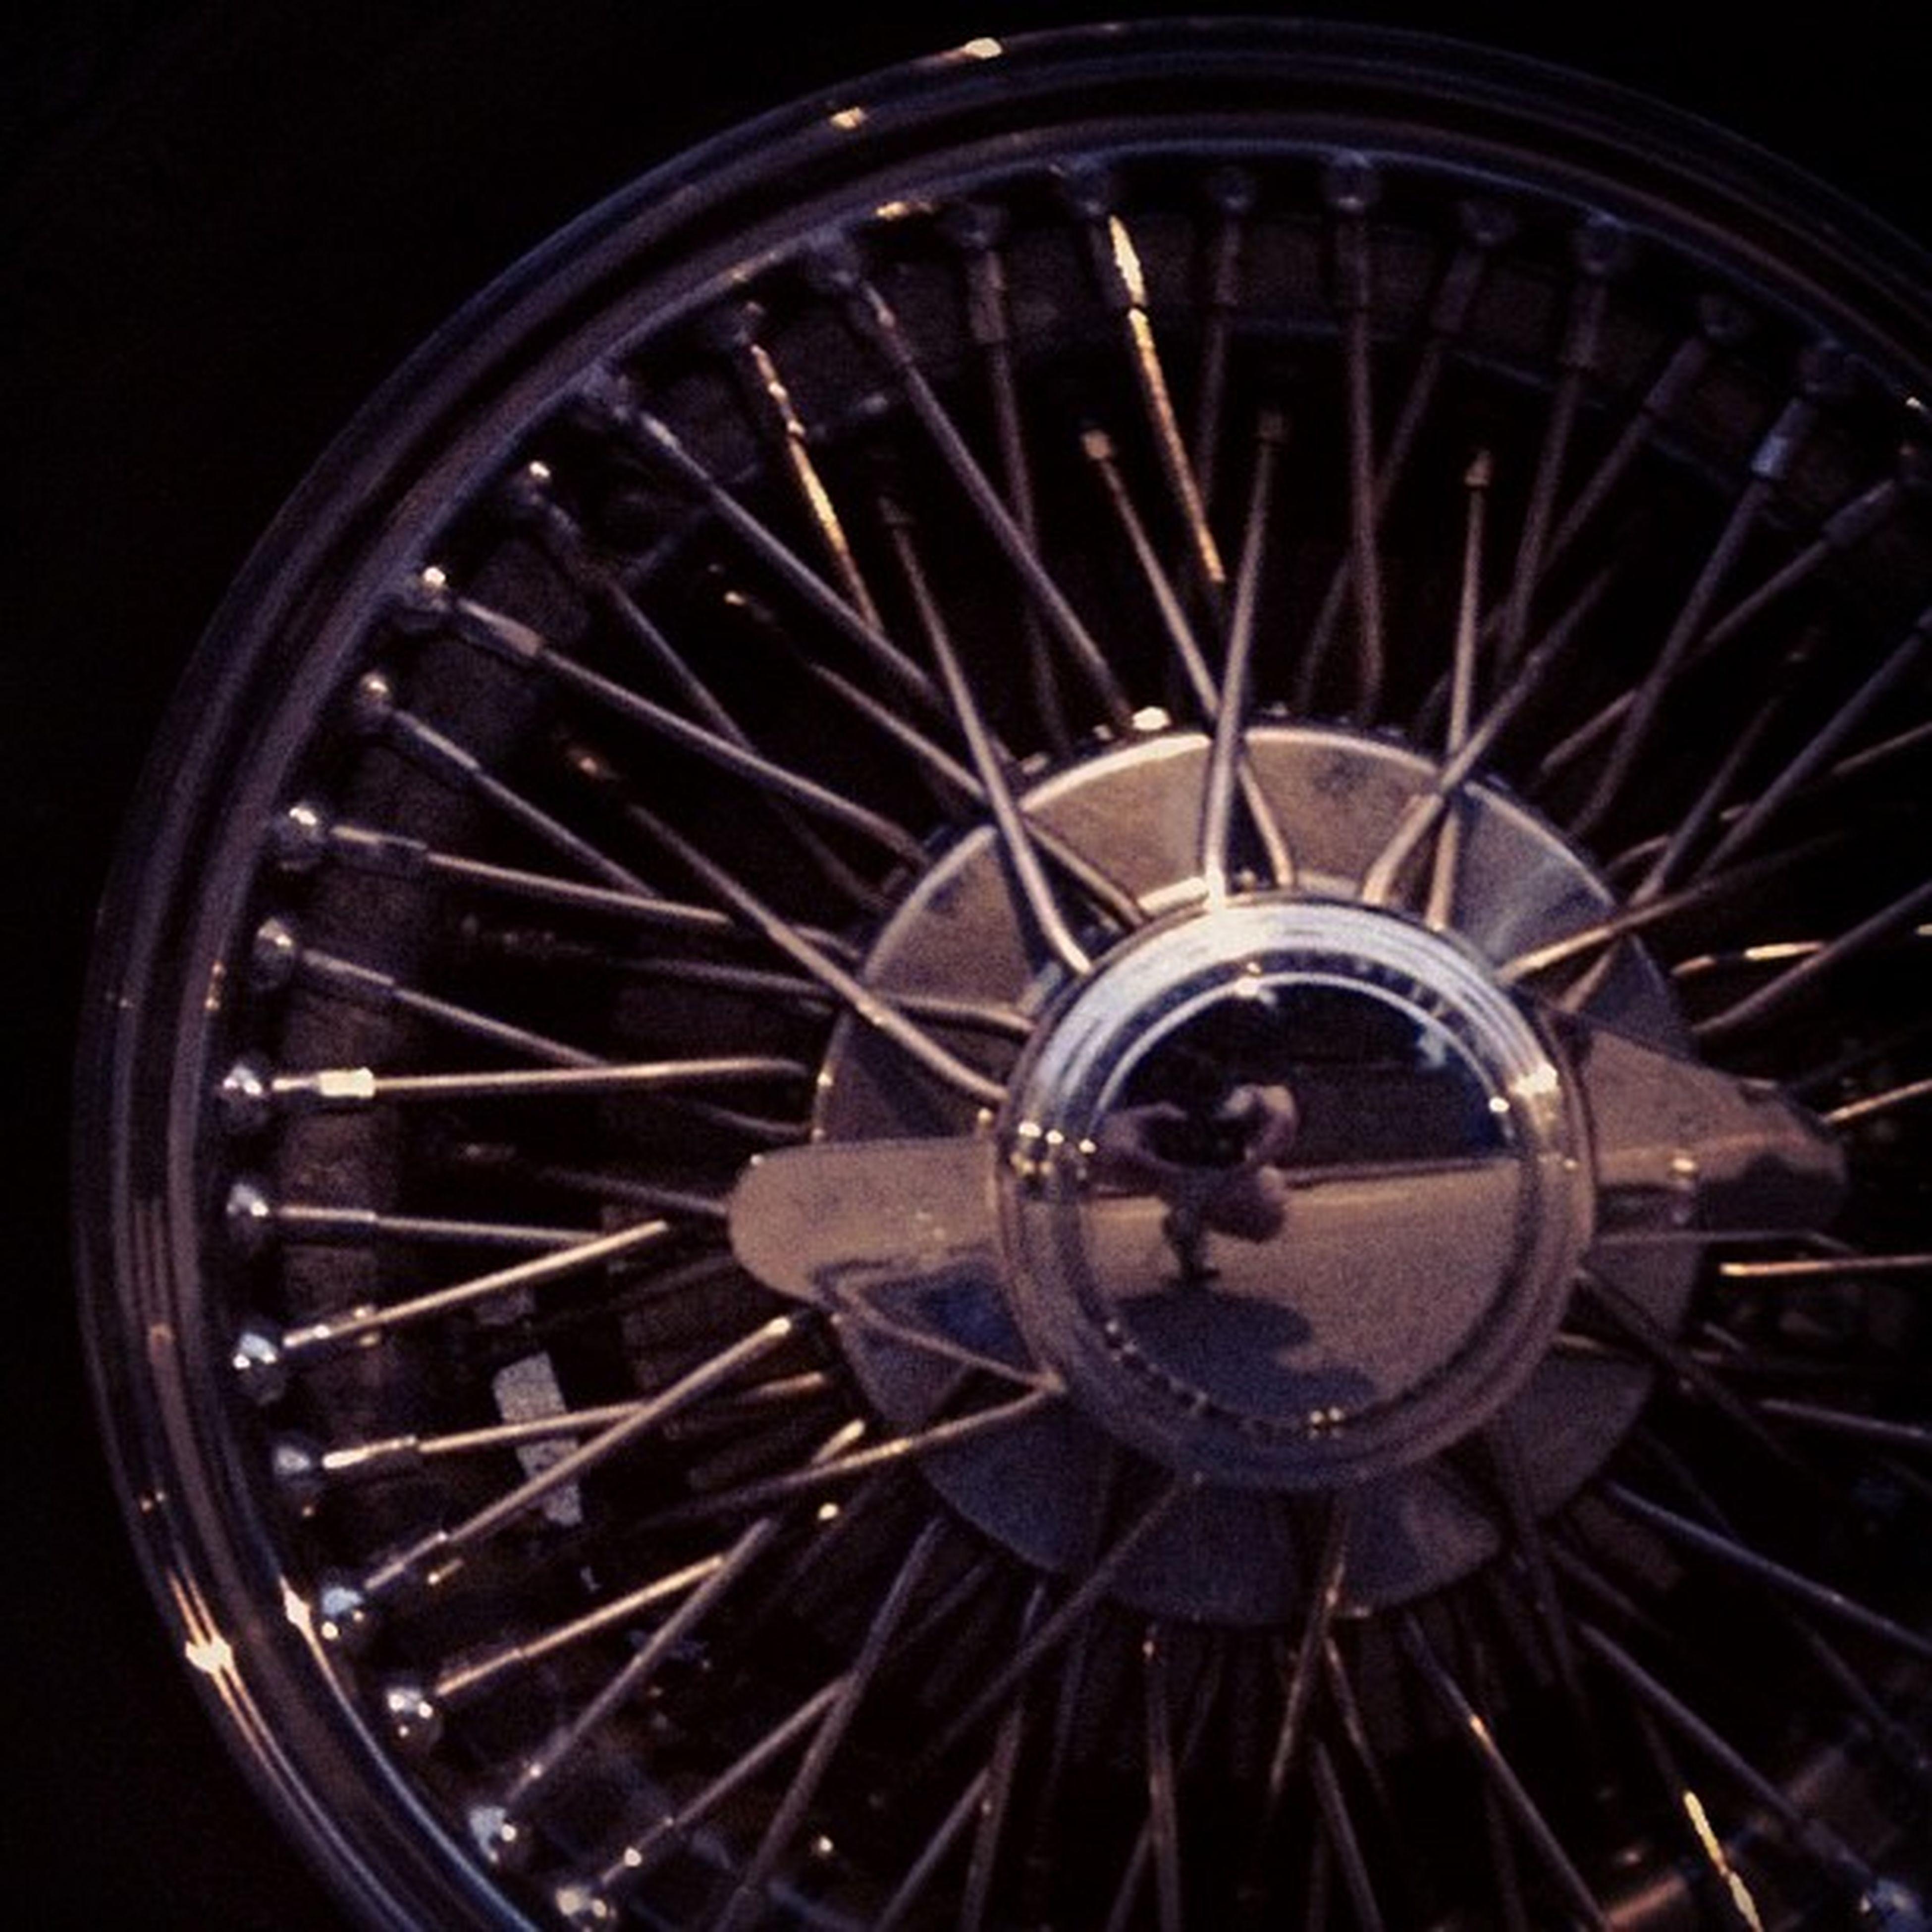 circle, wheel, metal, geometric shape, indoors, time, close-up, round, old-fashioned, clock, metallic, no people, pattern, illuminated, retro styled, ferris wheel, night, low angle view, shape, circular